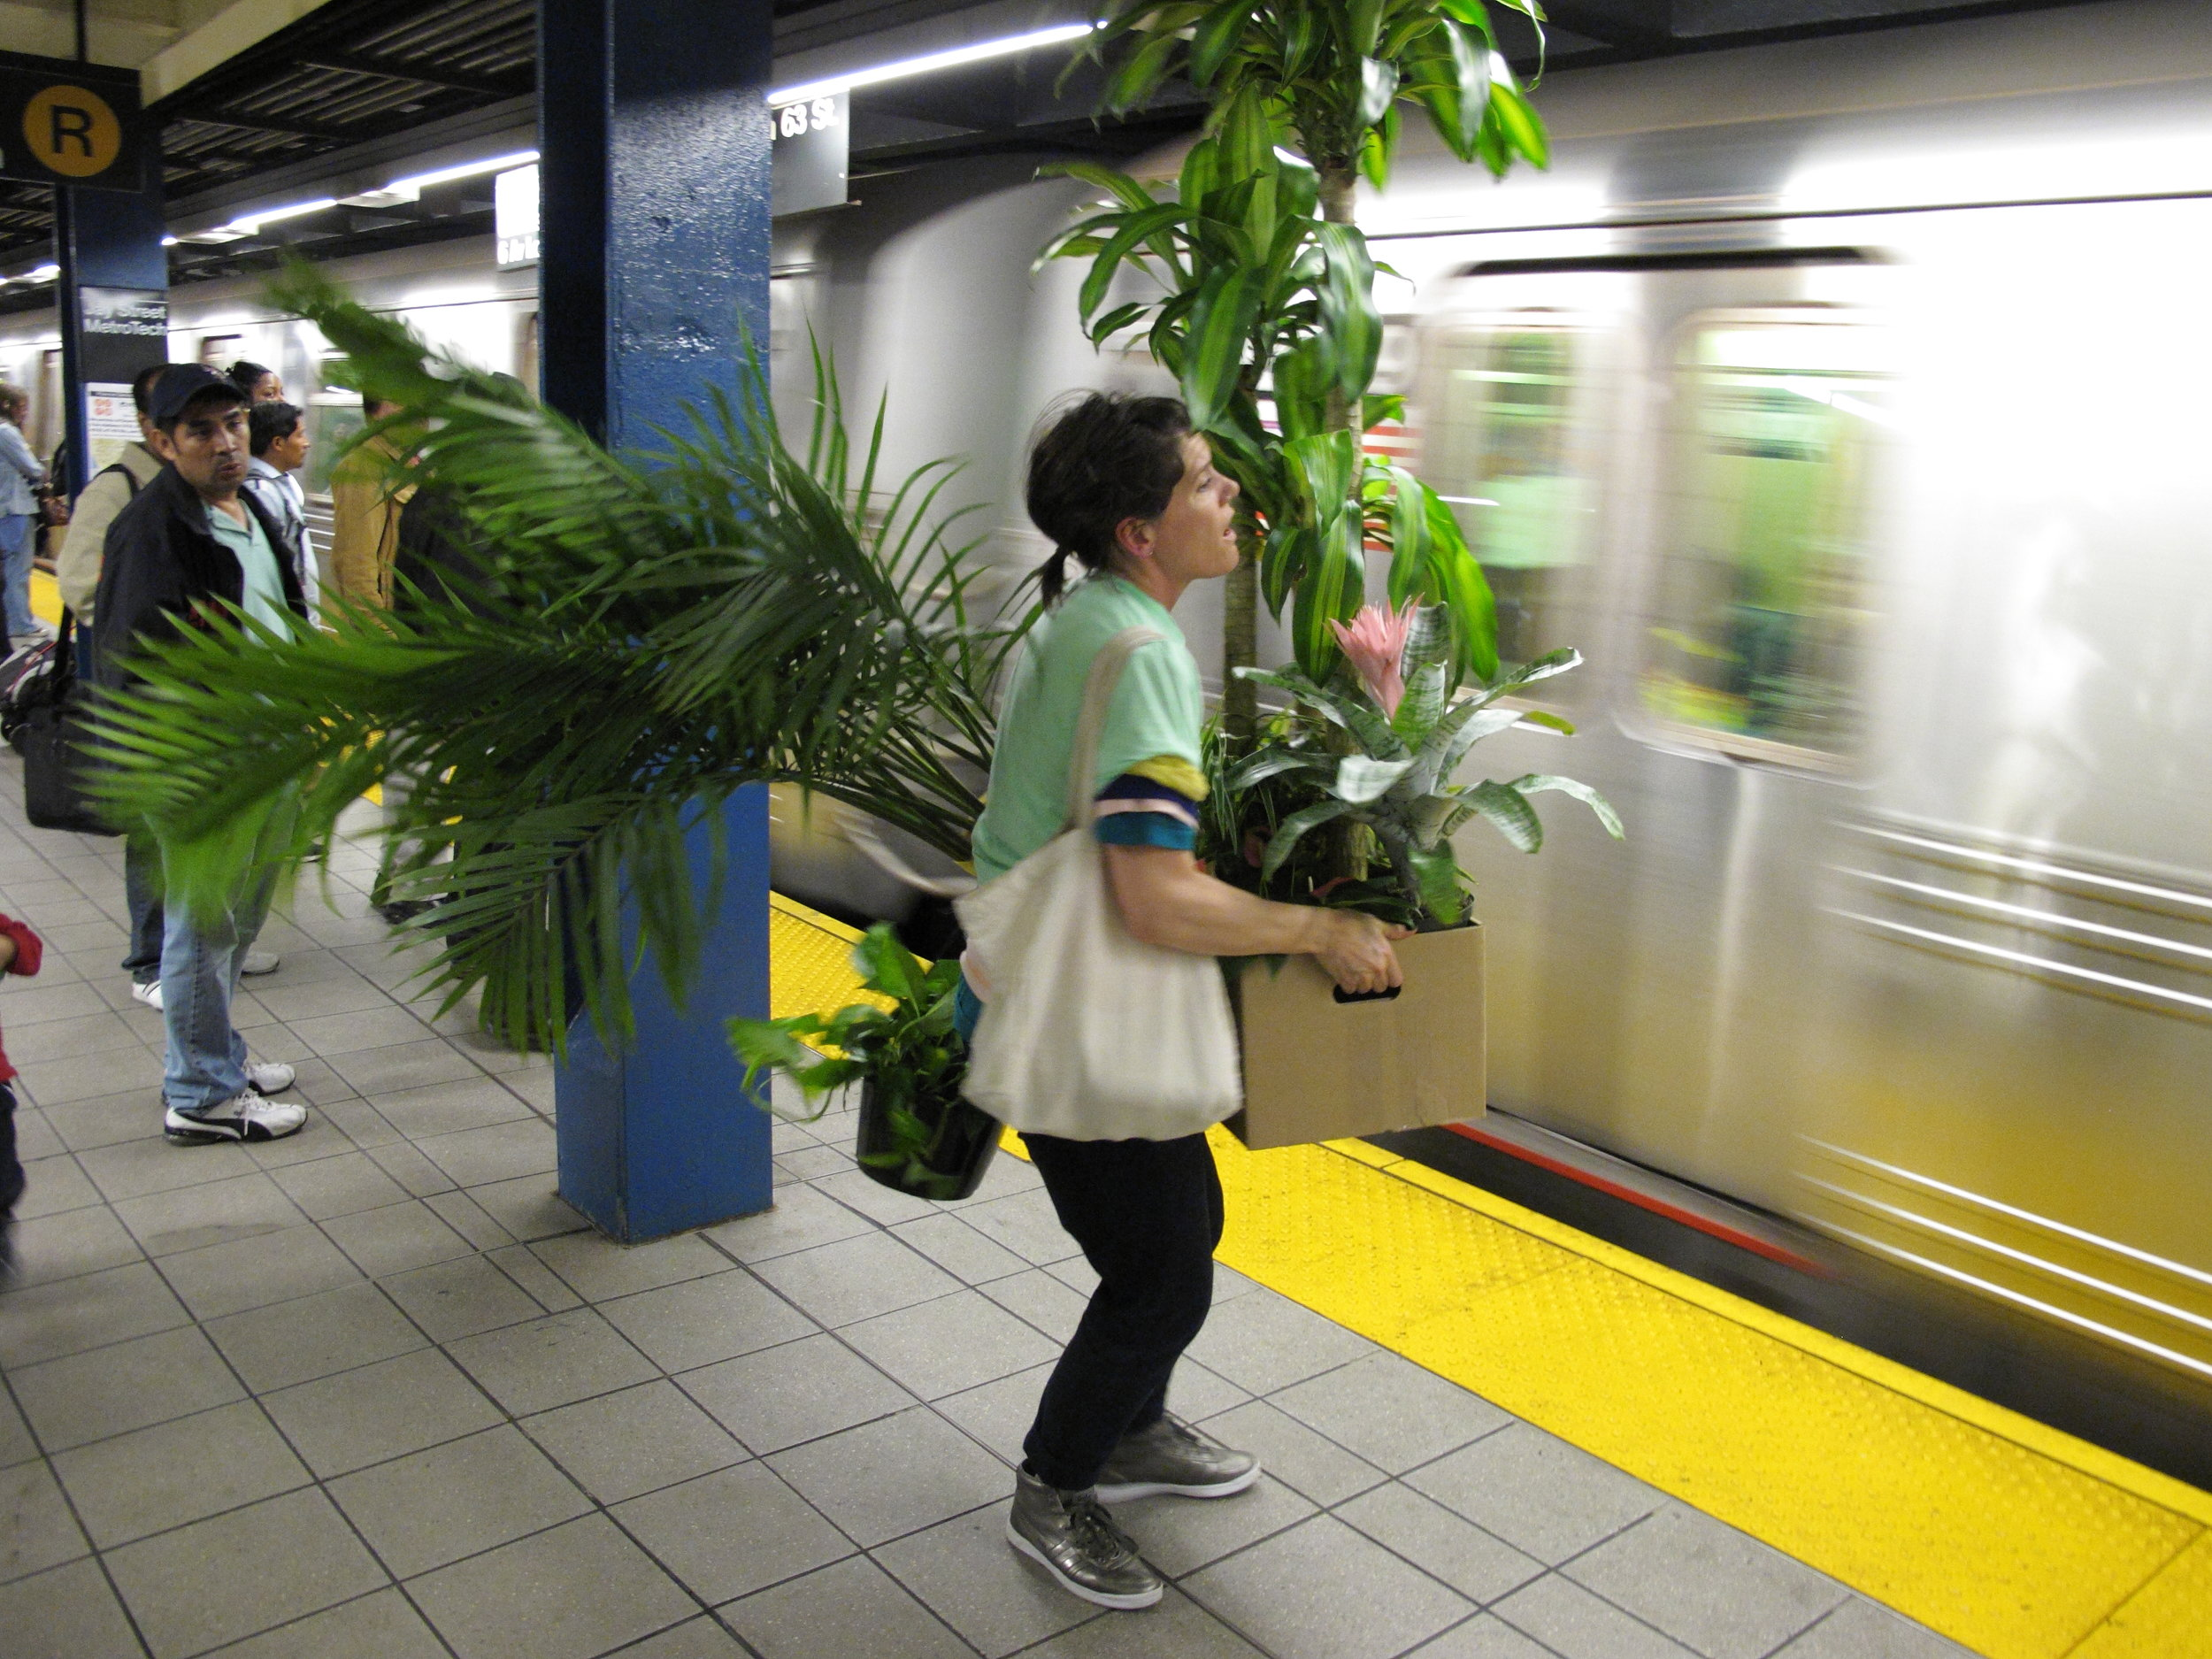 Subway_platform.JPG